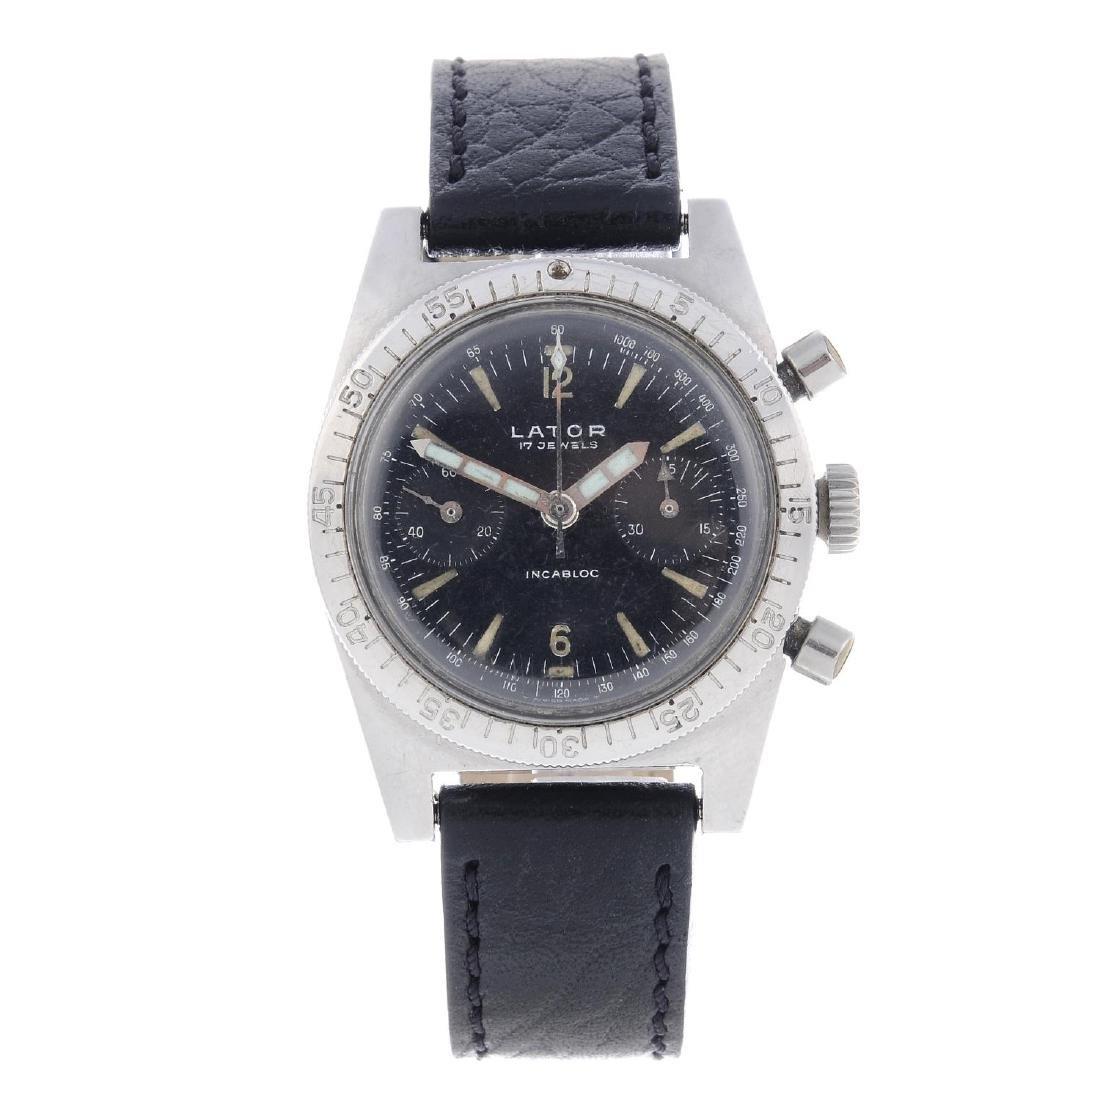 LATOR - a gentleman's chronograph wrist watch.